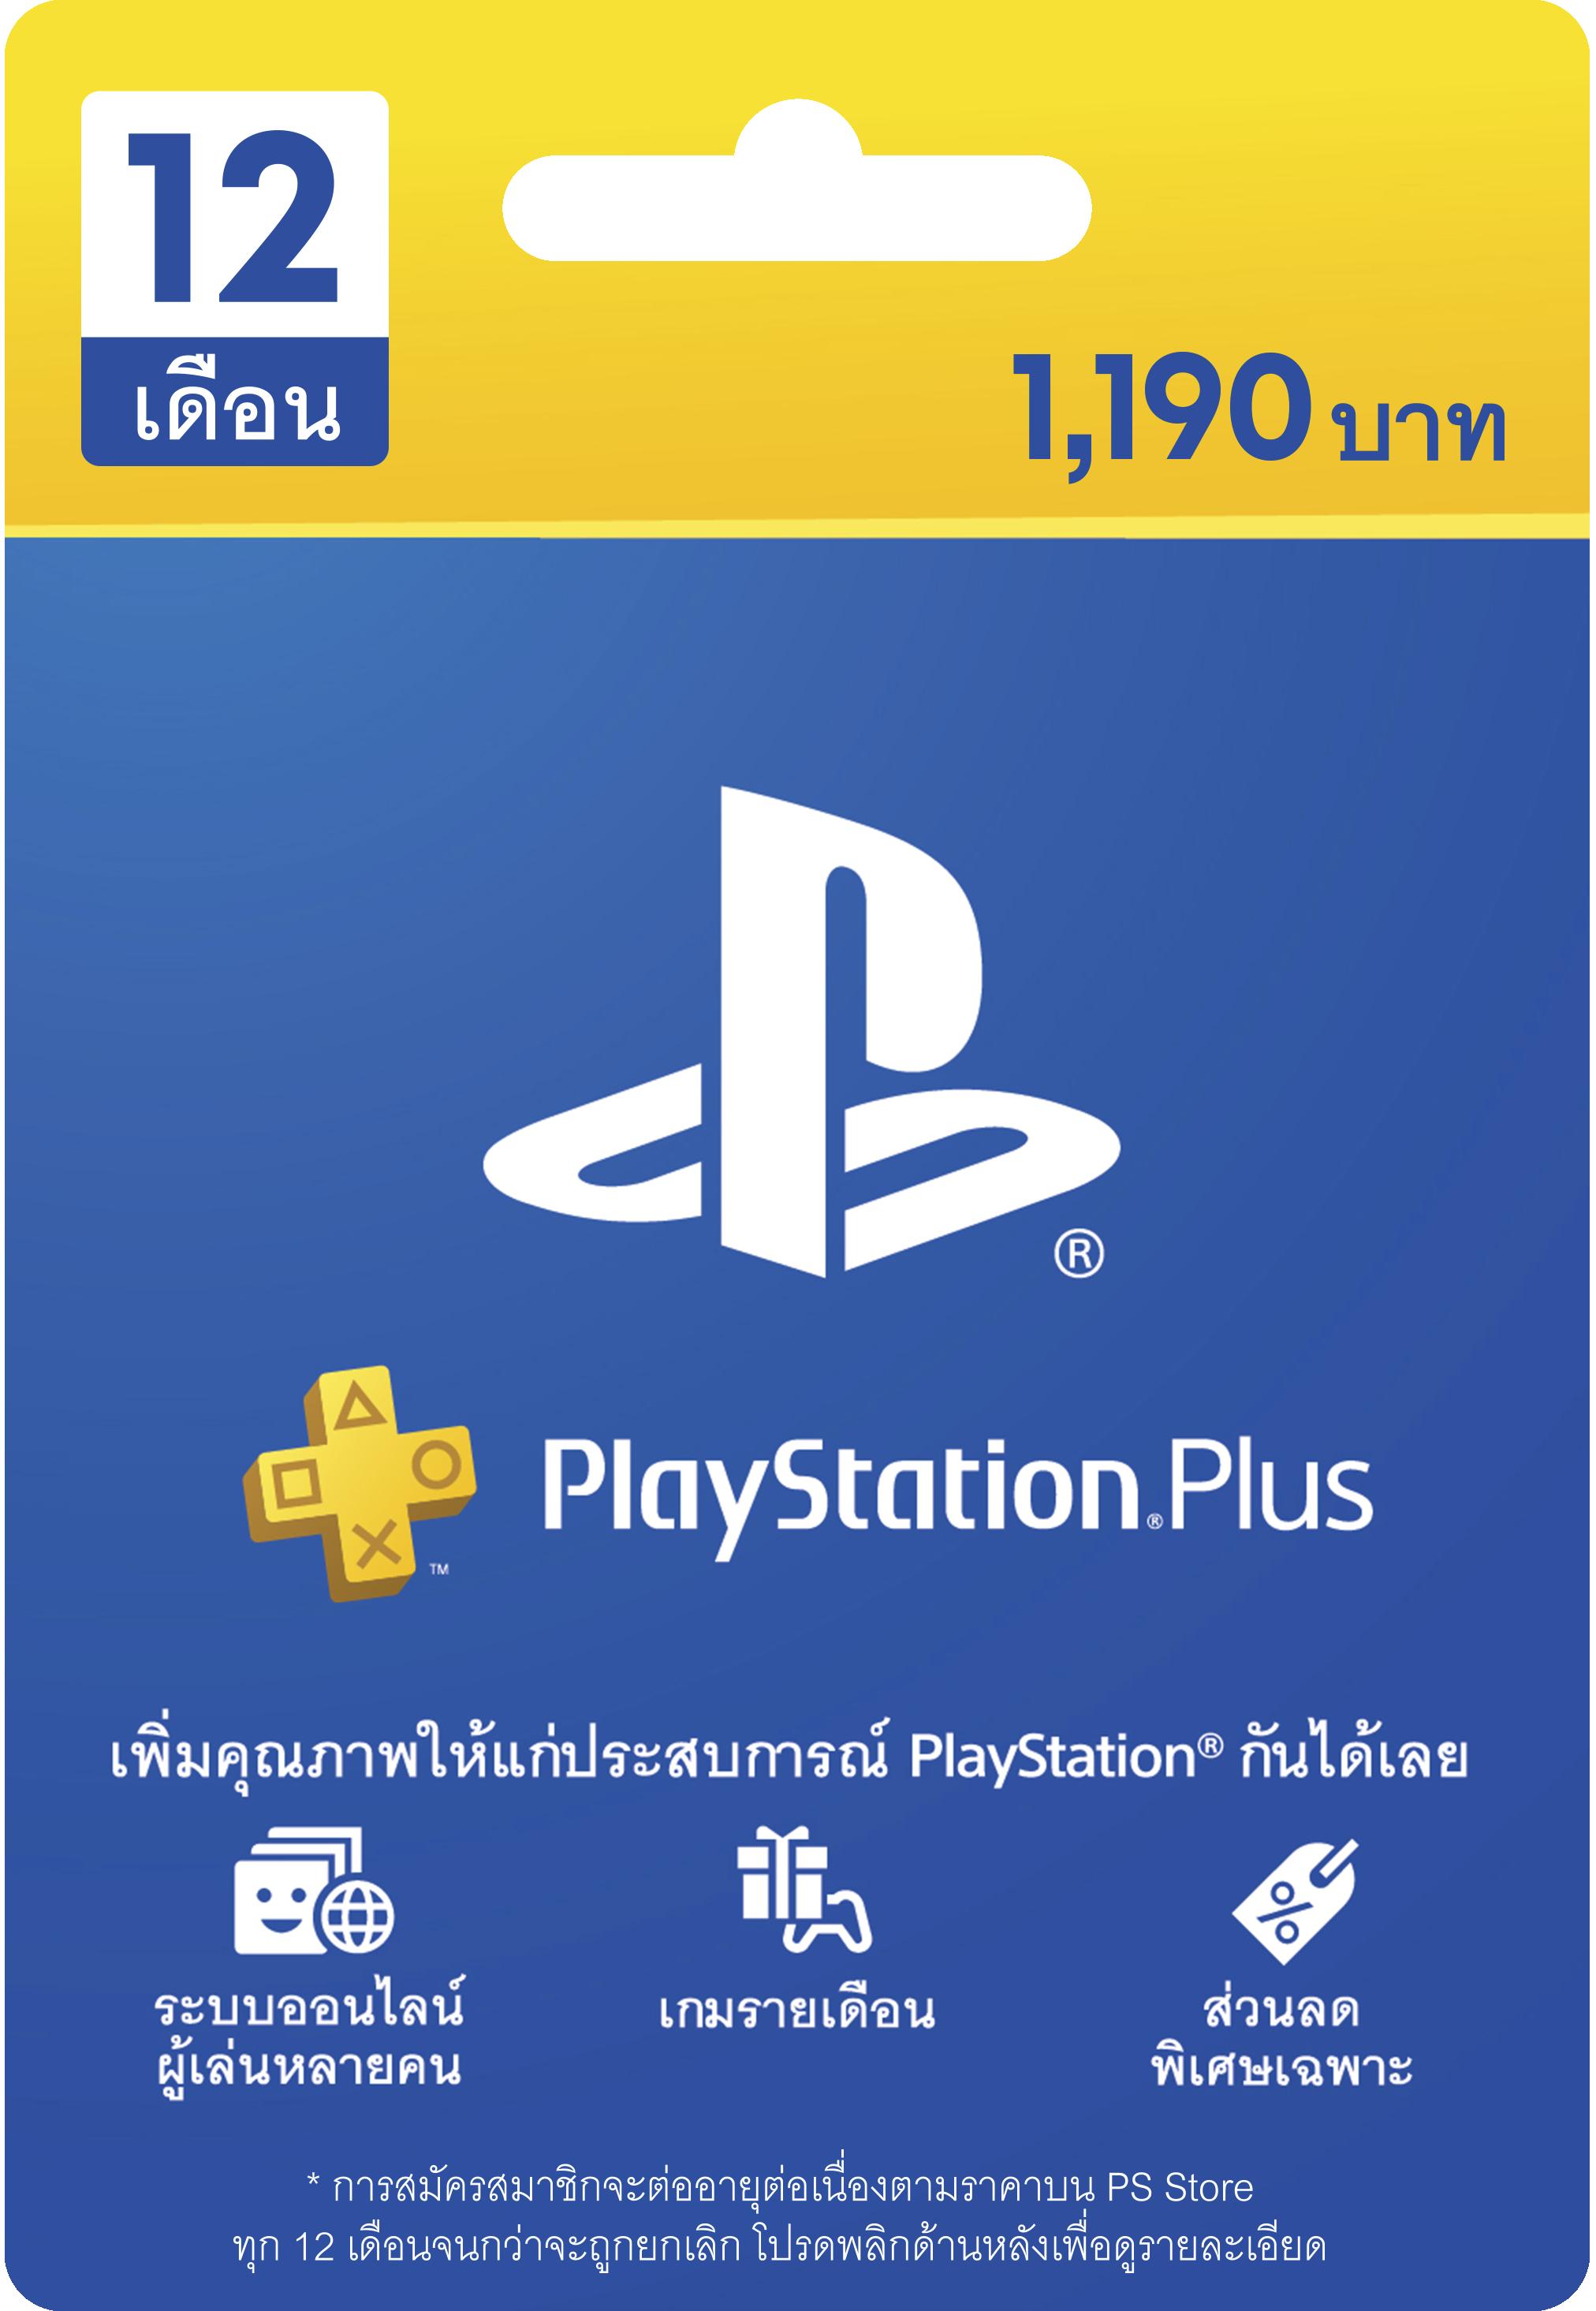 PlayStation Plus card image